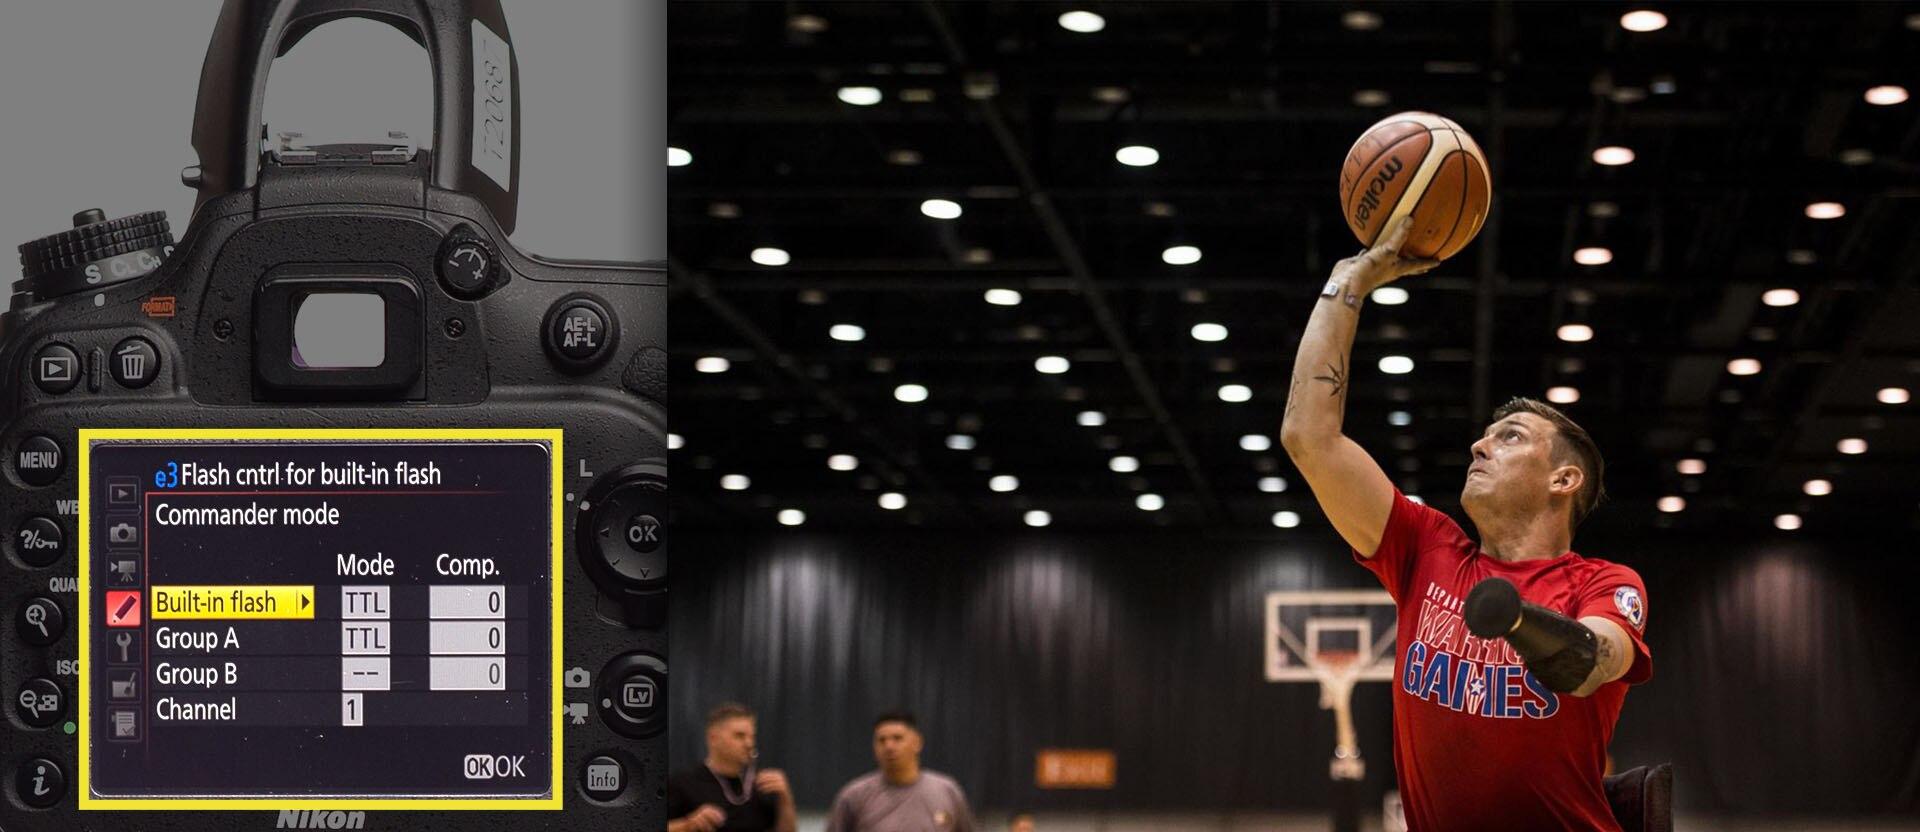 Basketball player with prosthetic arm shoots basketball